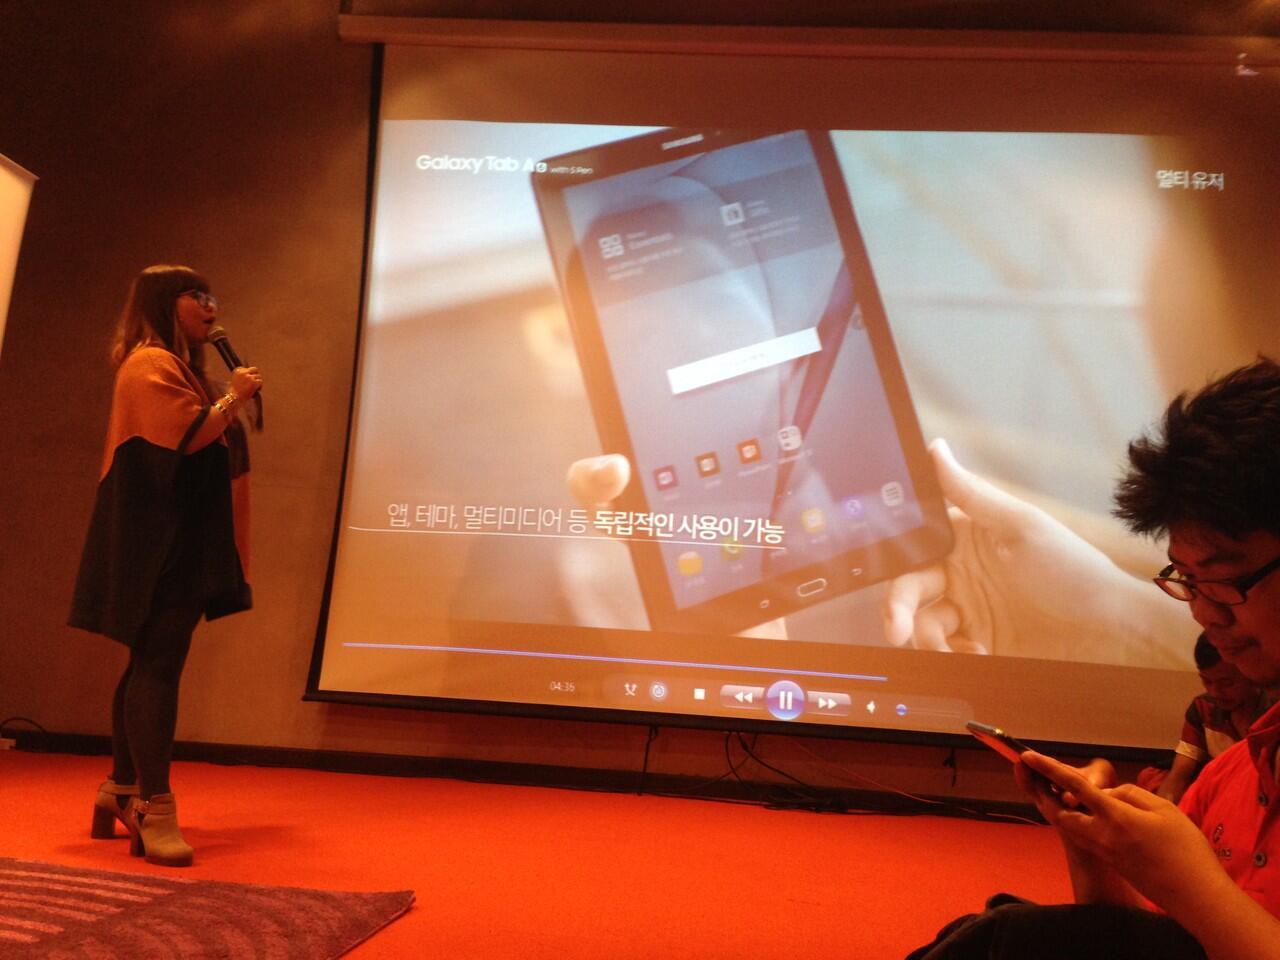 [FR] Samsung Galaxy Tab A6 2016 With S Pen Bikin Agan Dan Sista Lebih Produktif